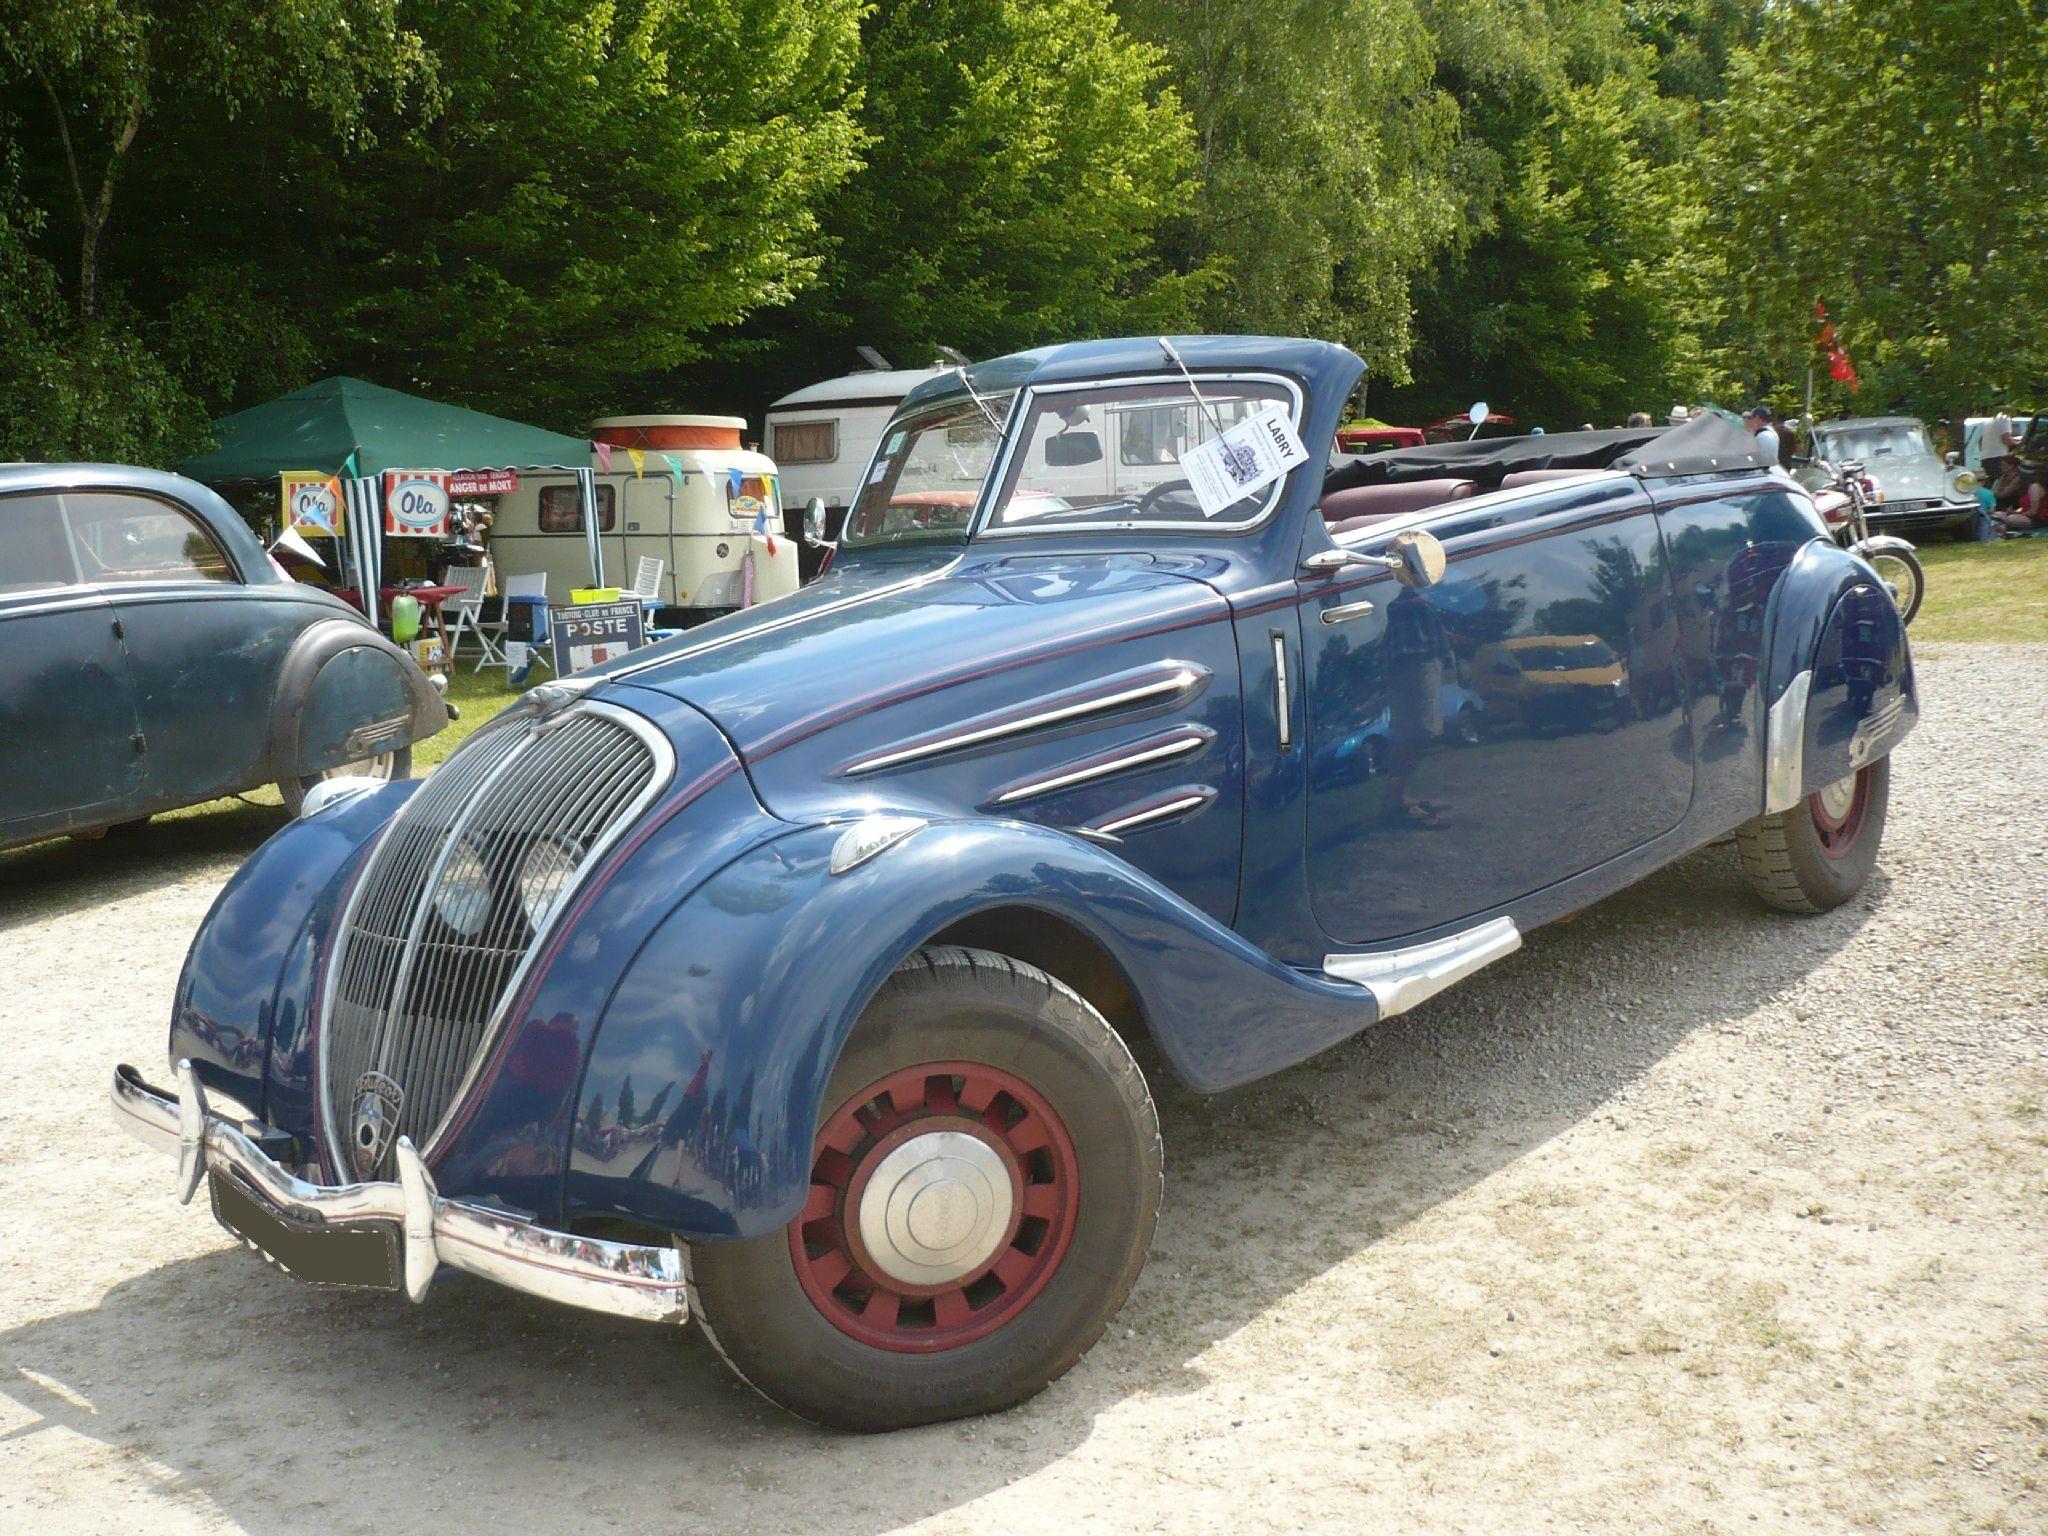 peugeot 402 cabriolet voitures anciennes pinterest voitures voitures anciennes et ancien. Black Bedroom Furniture Sets. Home Design Ideas